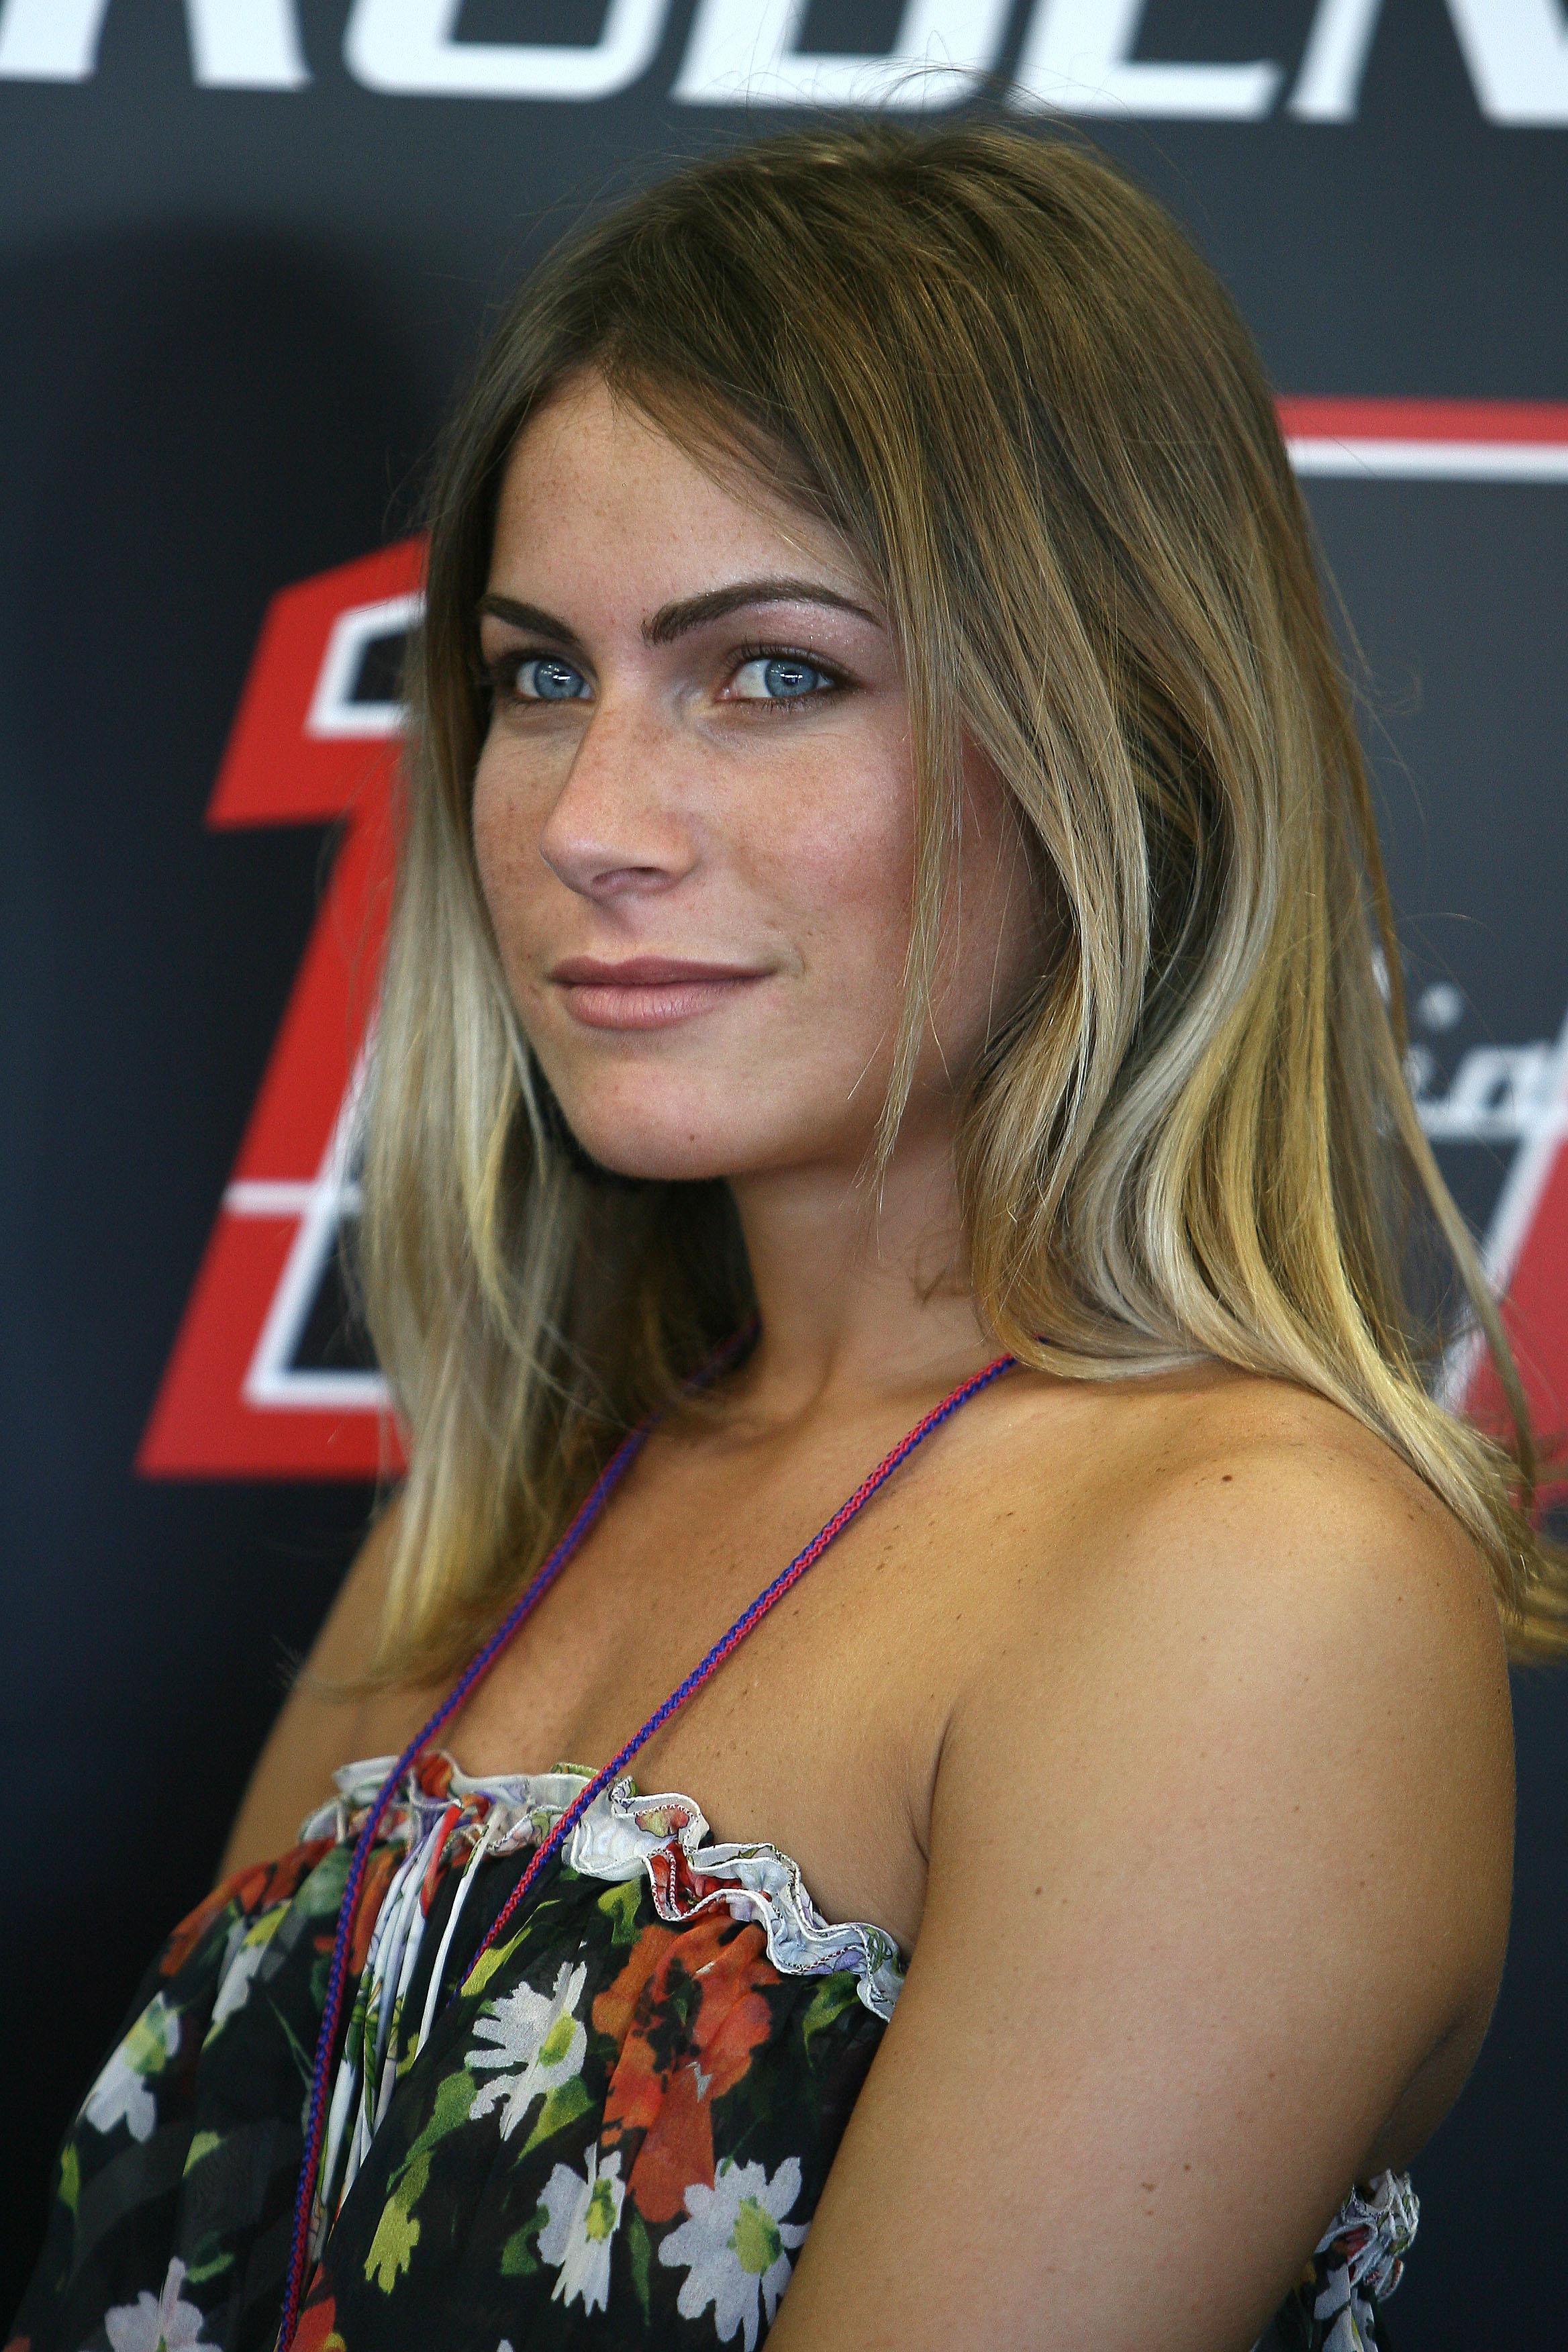 Wsb Max Biaggi S Girlfriend Eleonora Pe Visordown